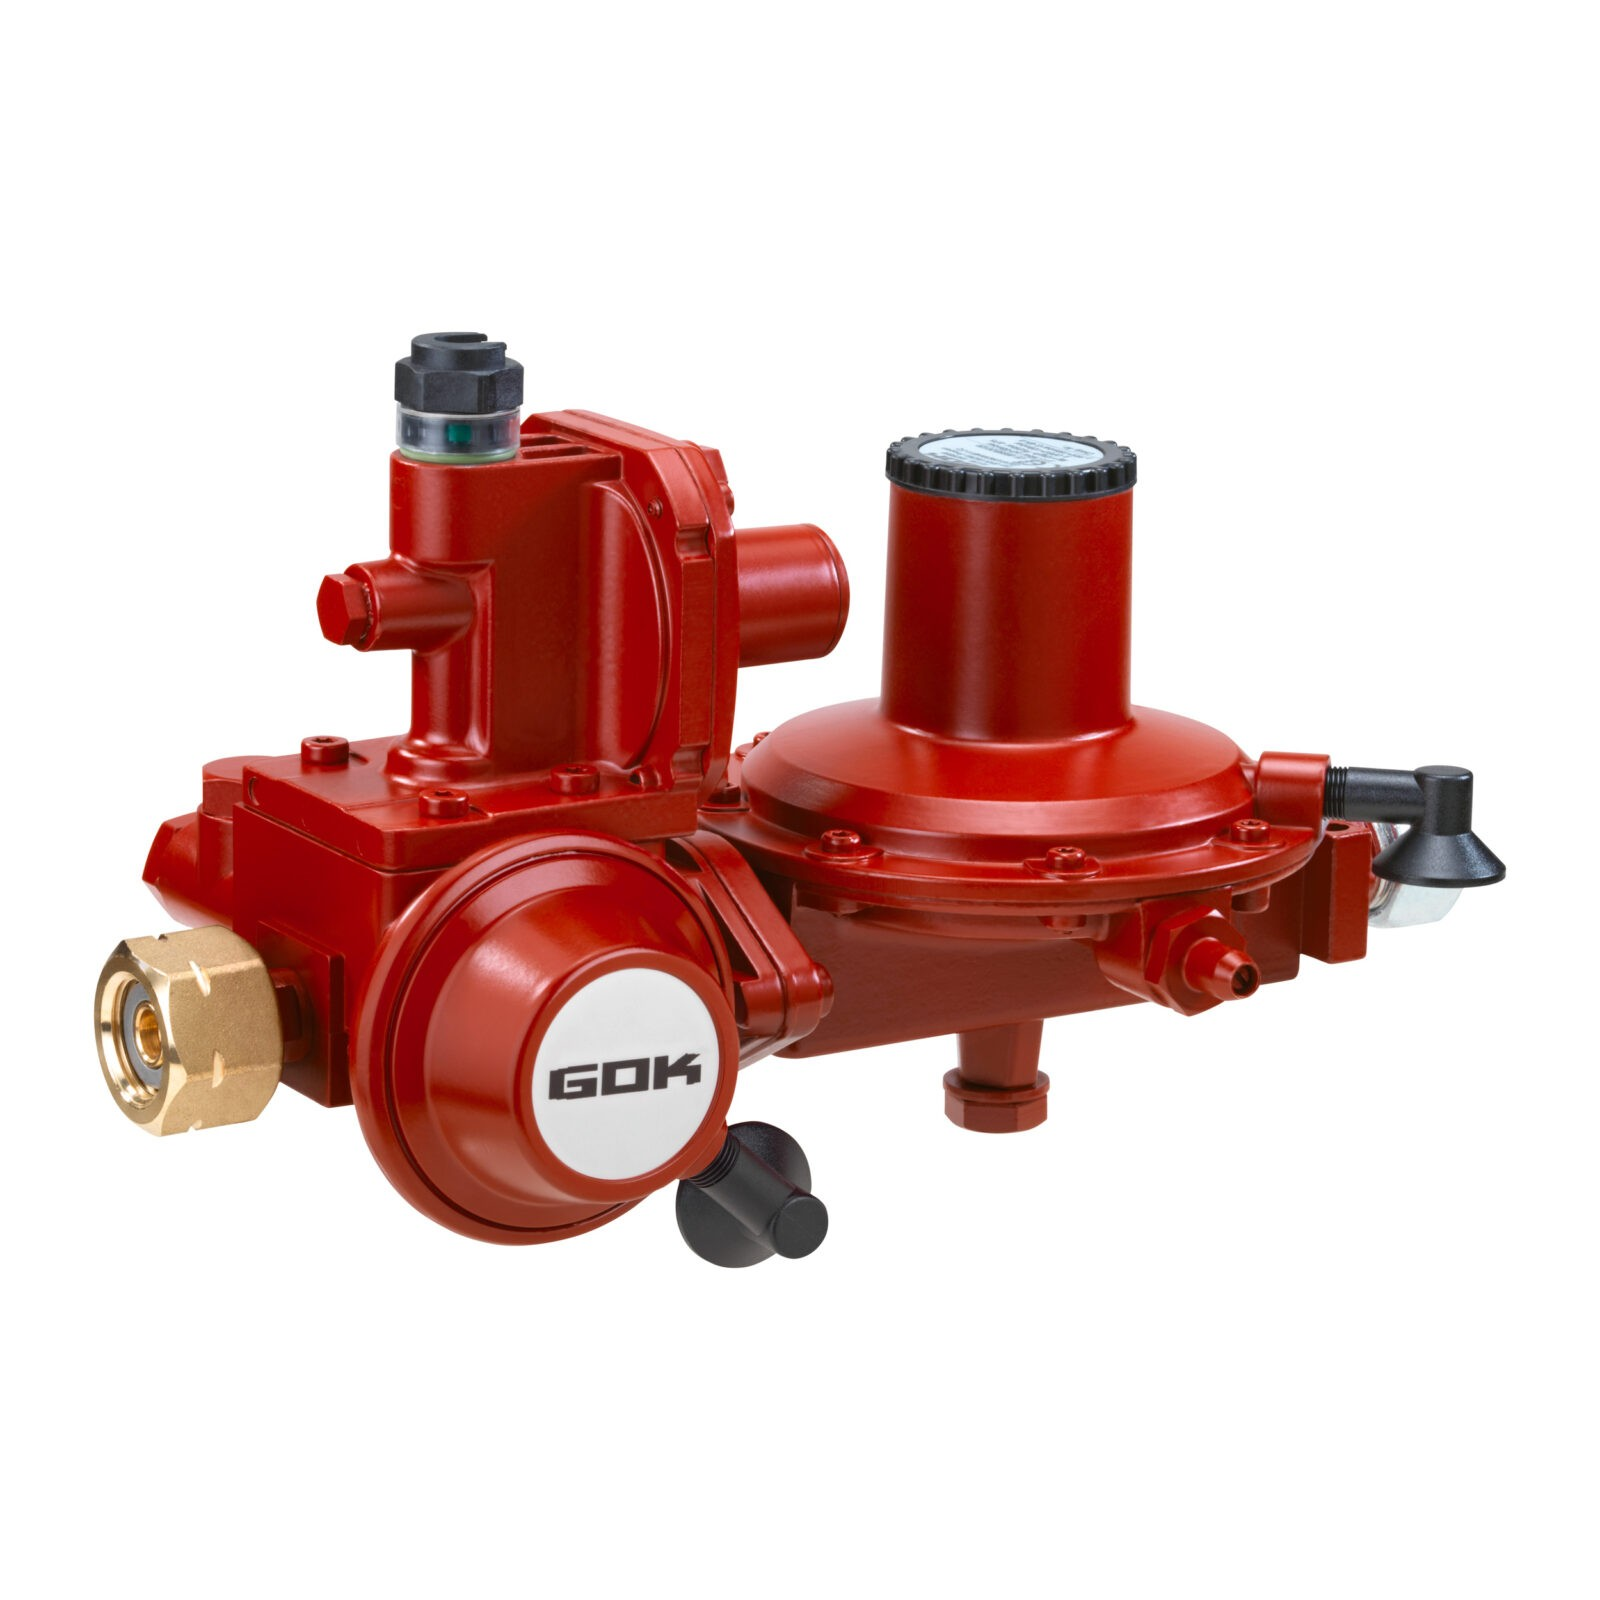 Регулятор давления газа GOK двухступенчатый 12кг/час 50мбар GF x G1/2 LH-KN ПСК ПЗК АП